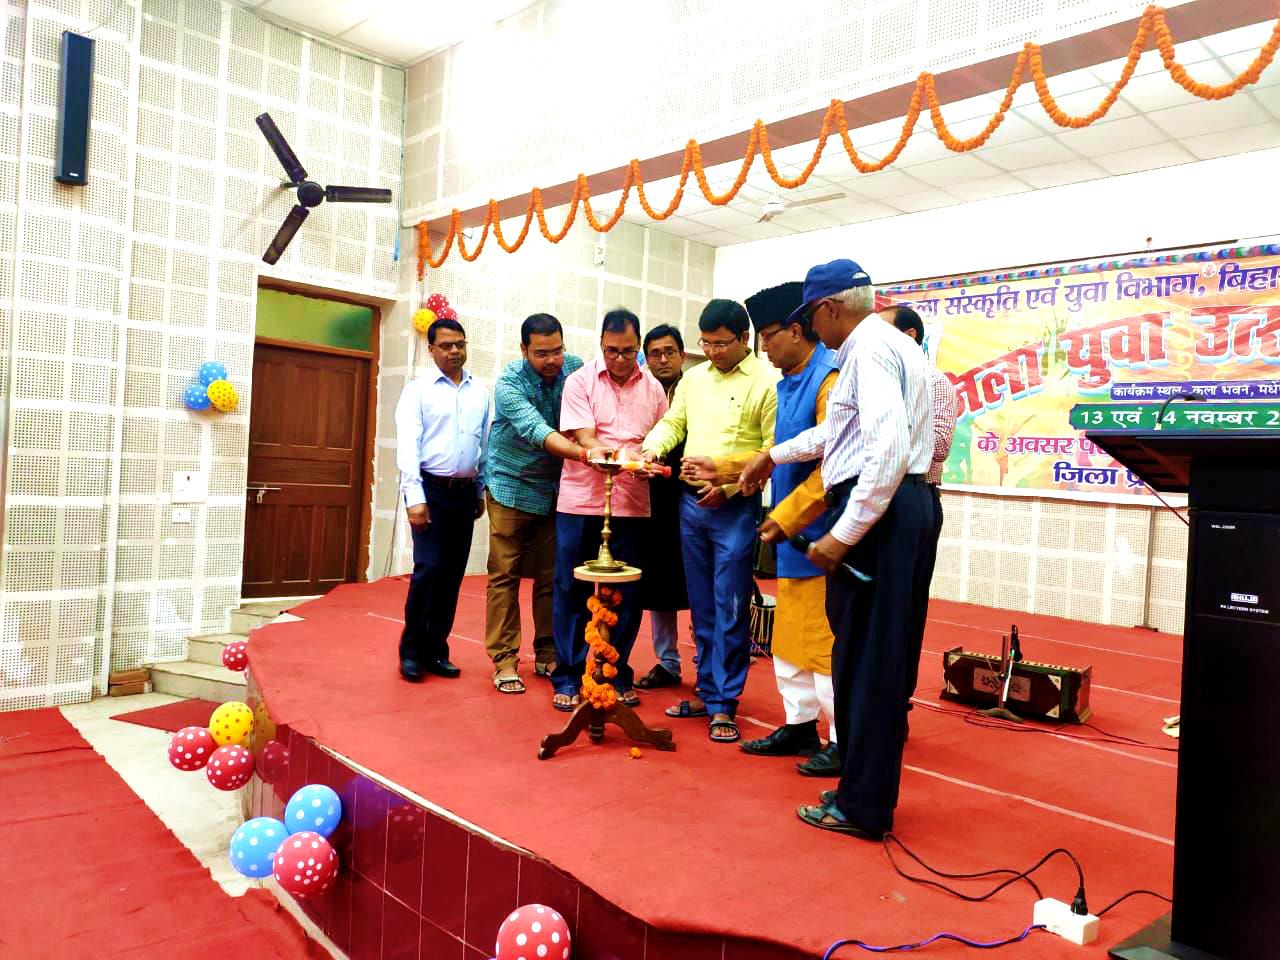 Dr.Madhepuri along with DM Navdeep Shukla inaugurating Zila Yuva Utsav- 2019 with members Shaukat Ali, Gandhi kumar Mistri, Avinash Kumar, J.K.Yadav & others at Bhupendra Smriti Kala Bhawan Madhepura.